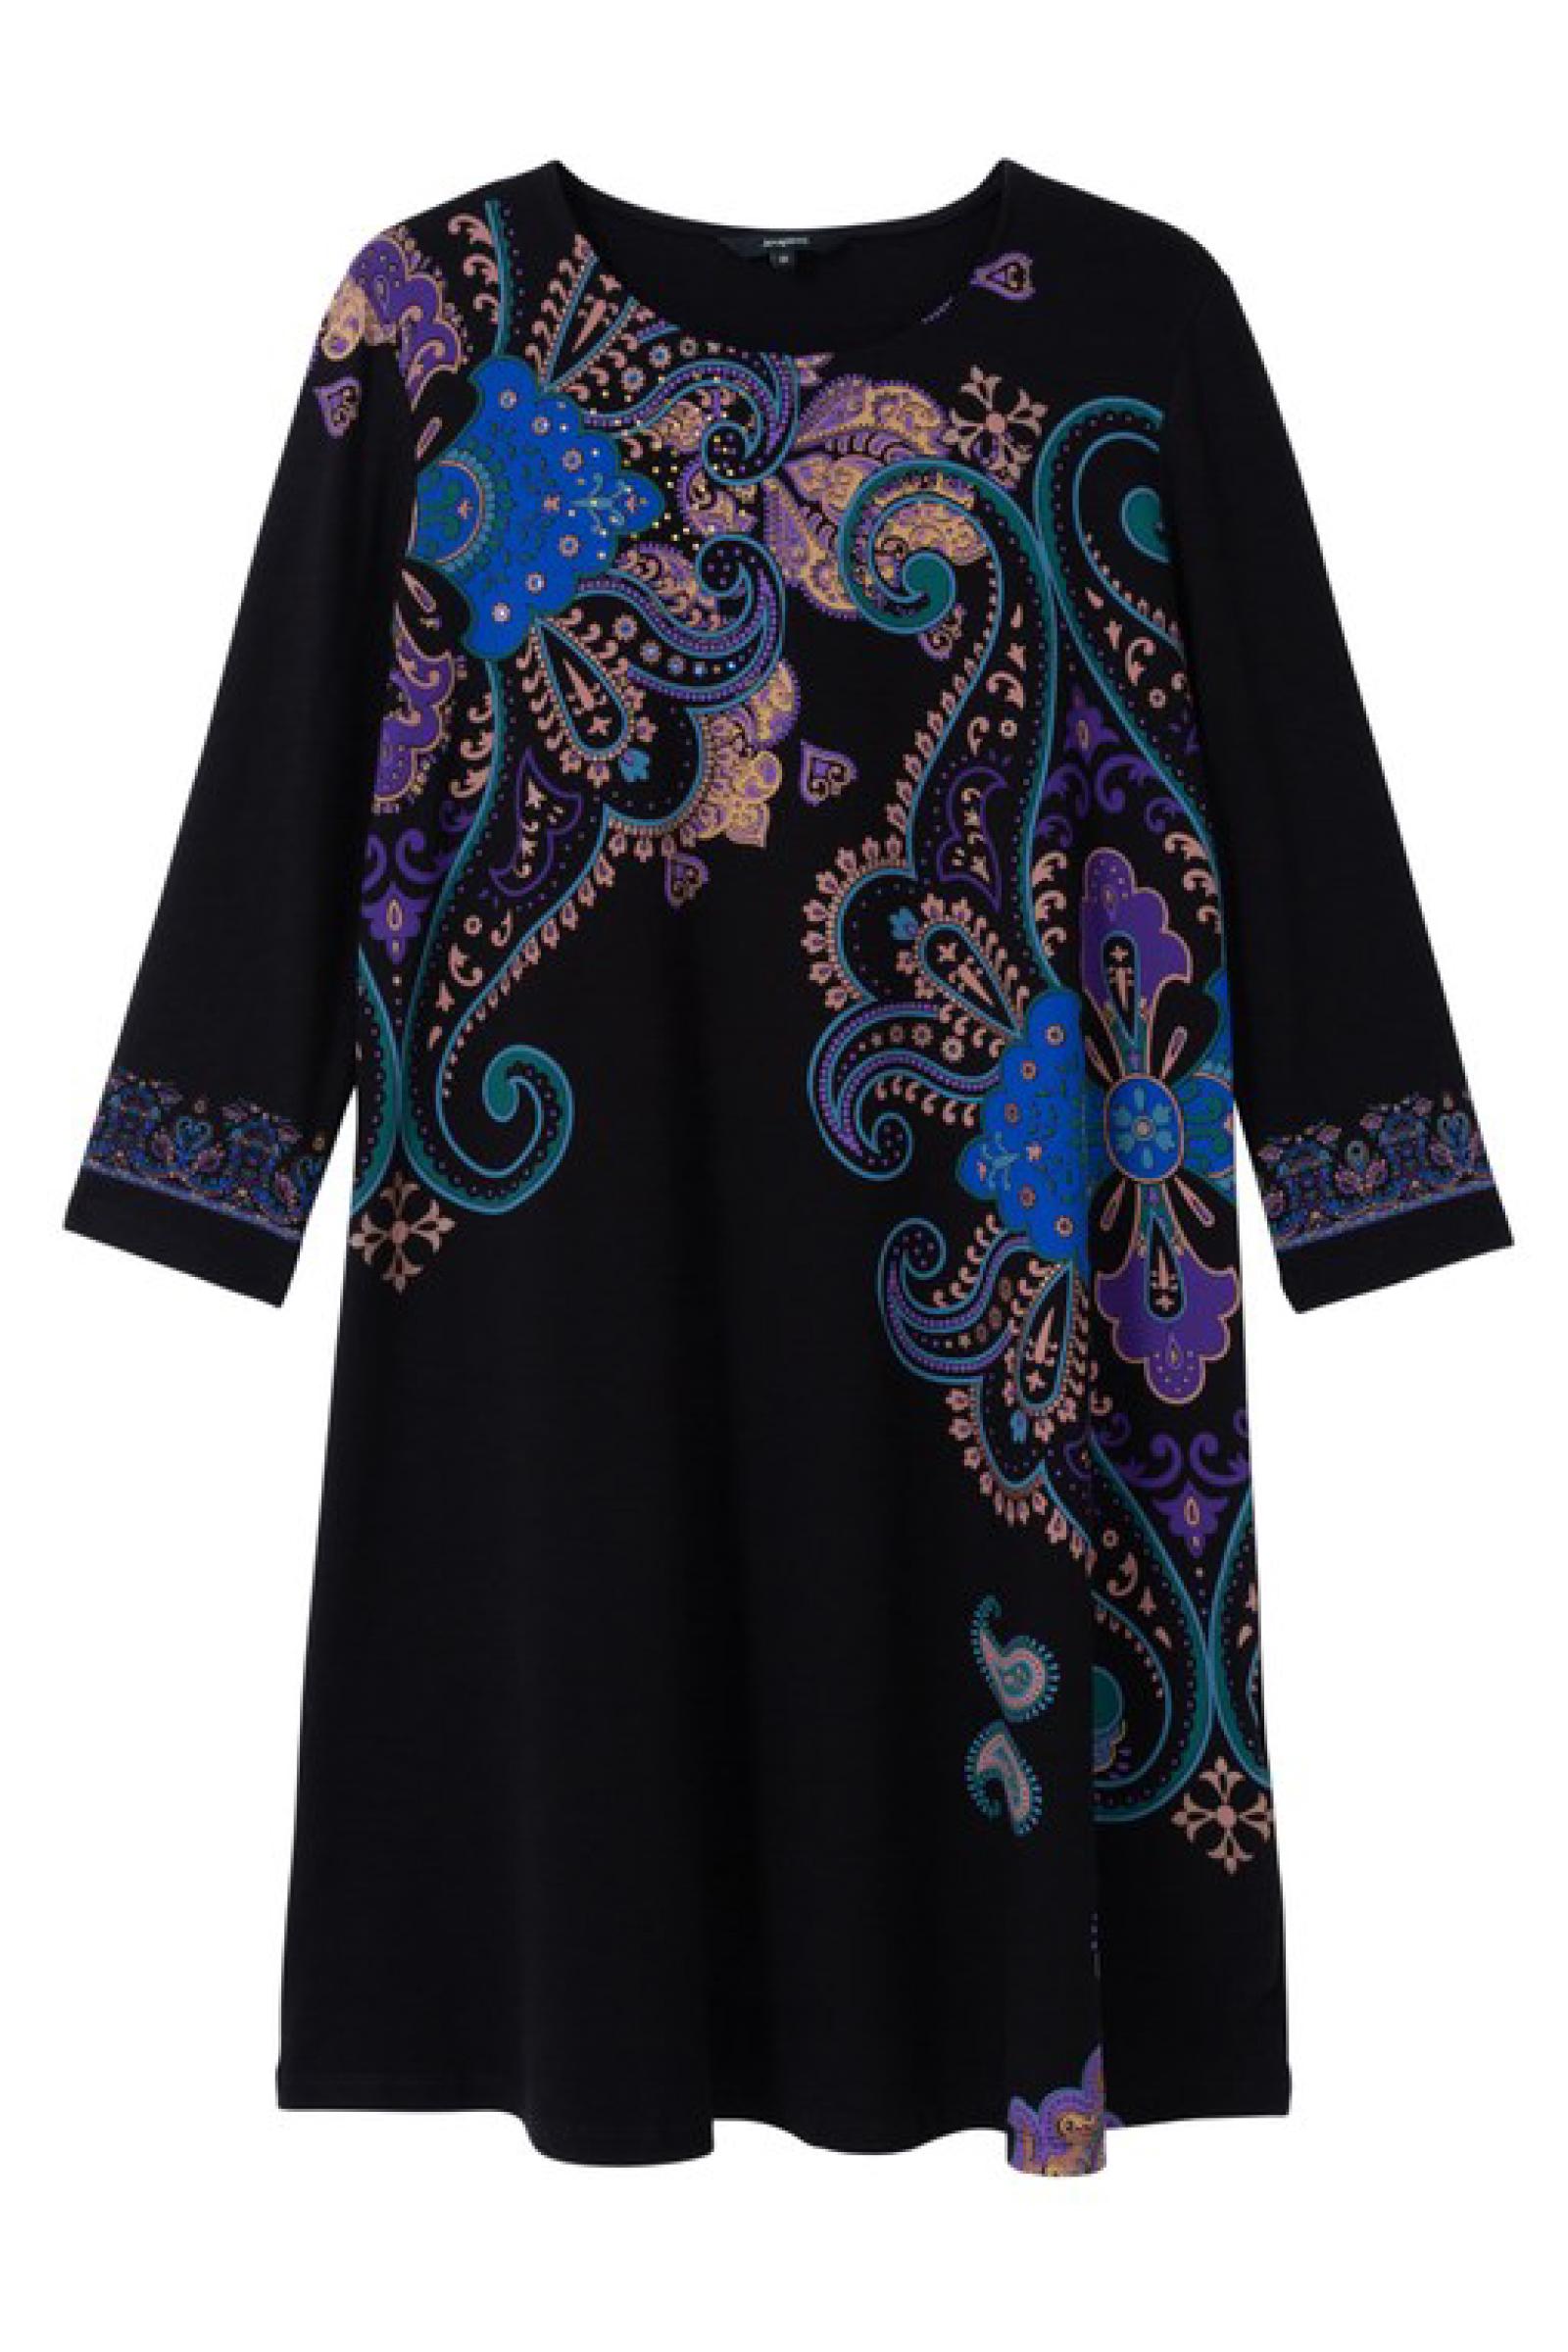 DESIGUAL Woman Dress Model WASHINGTON DESIGUAL   Dress   20WWVK902000